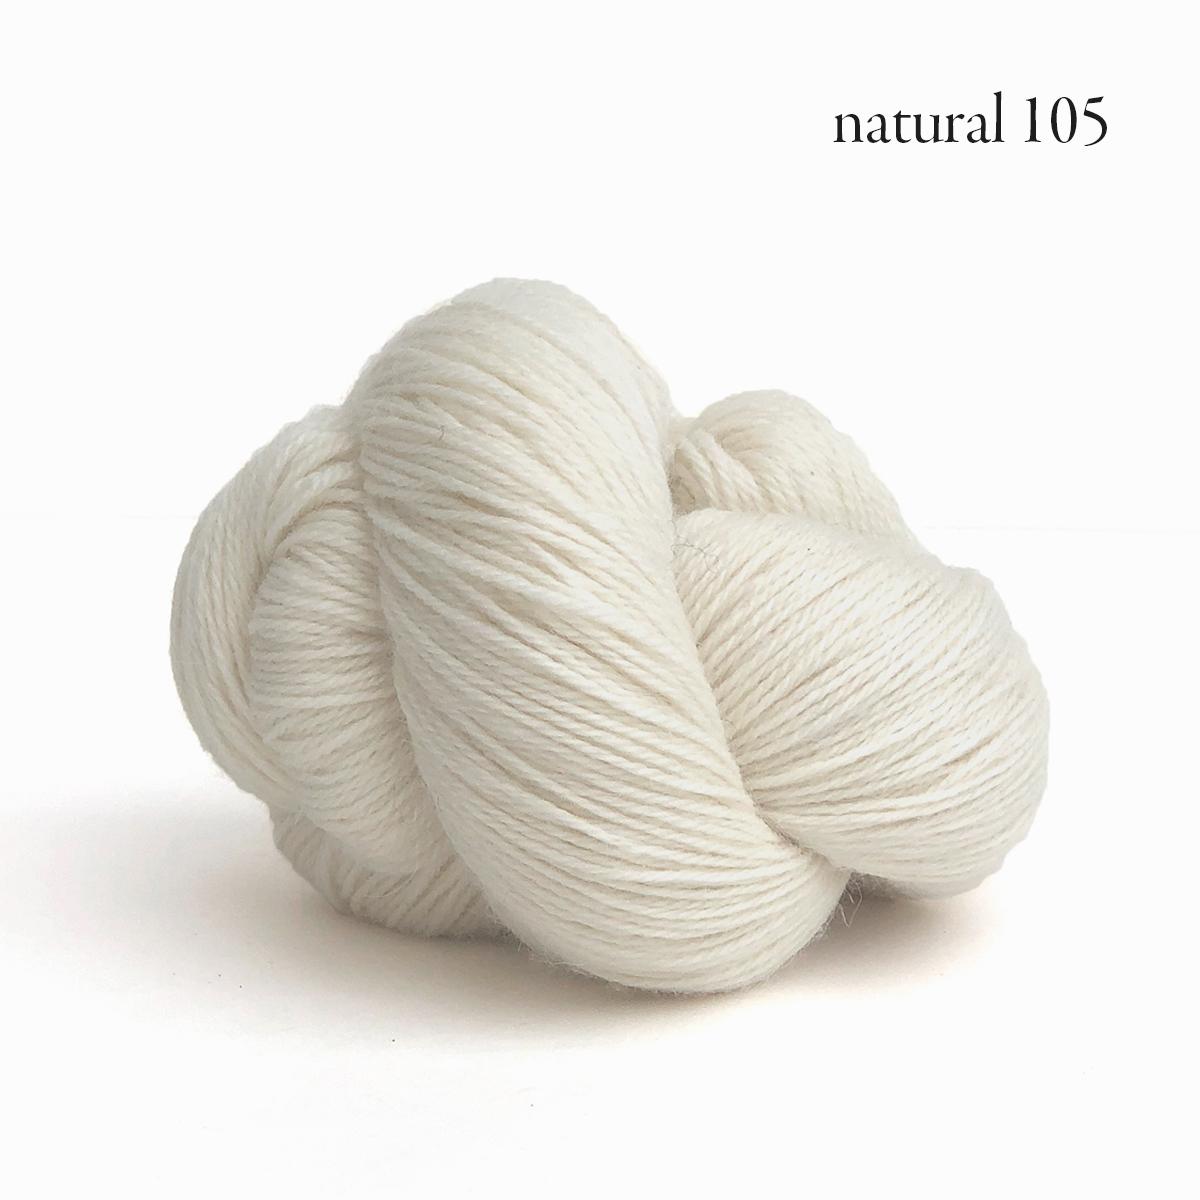 perennial natural 105.jpg